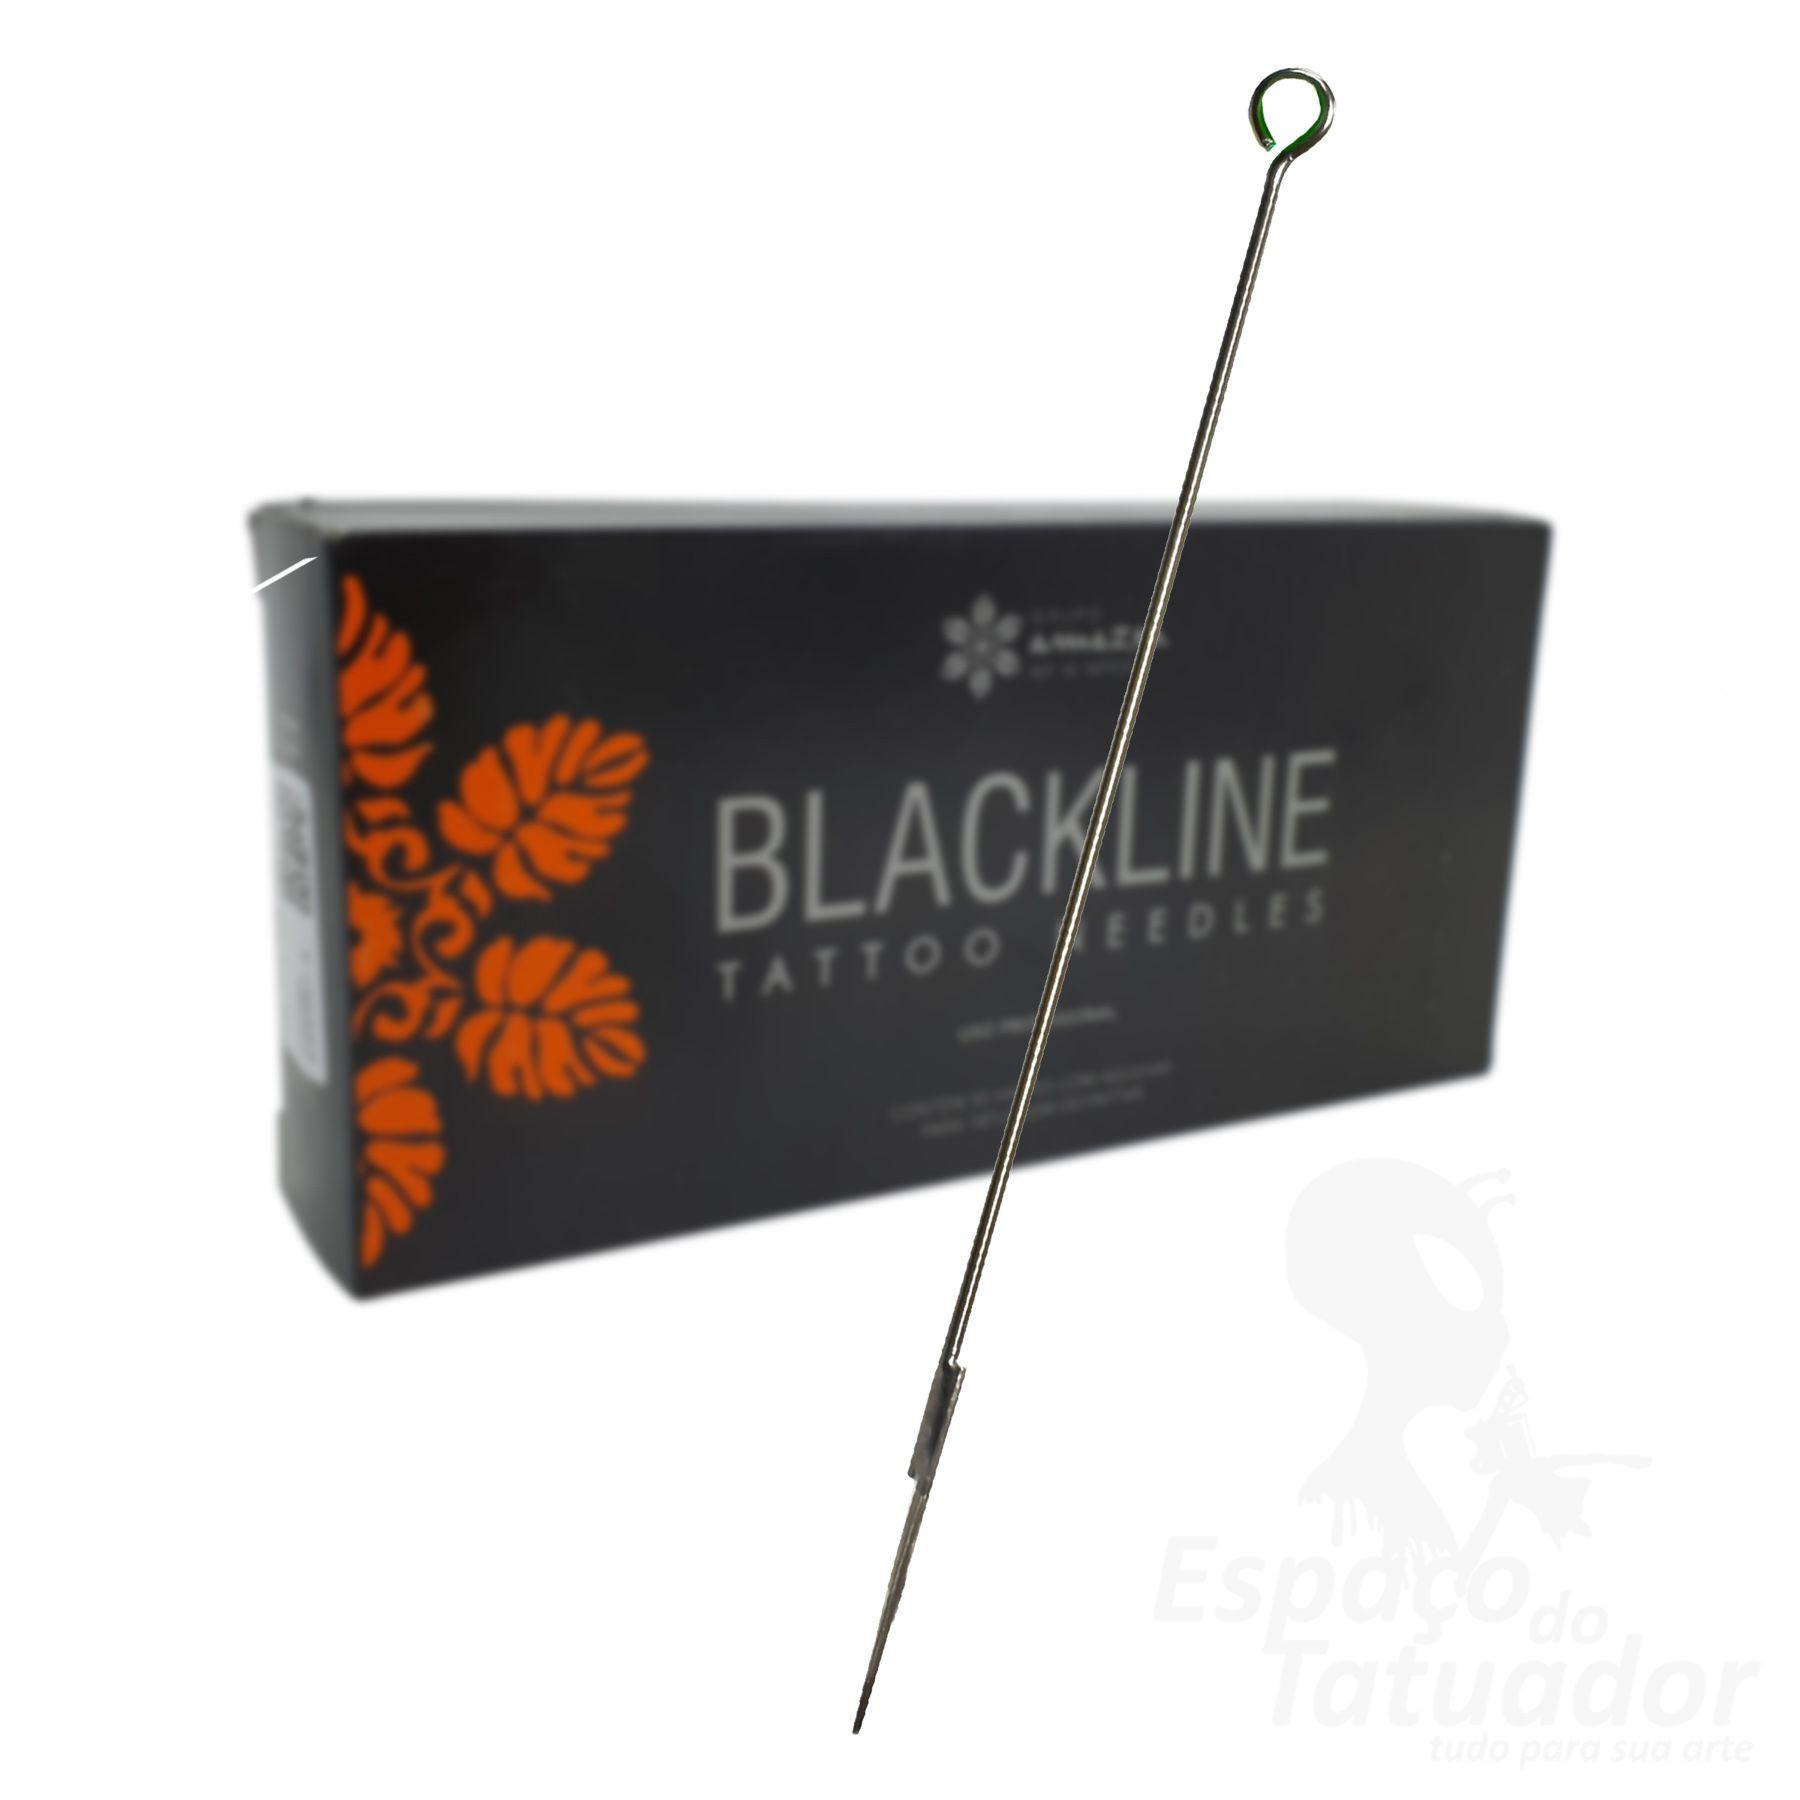 Agulha Black Line - RL 1204 - Unidade